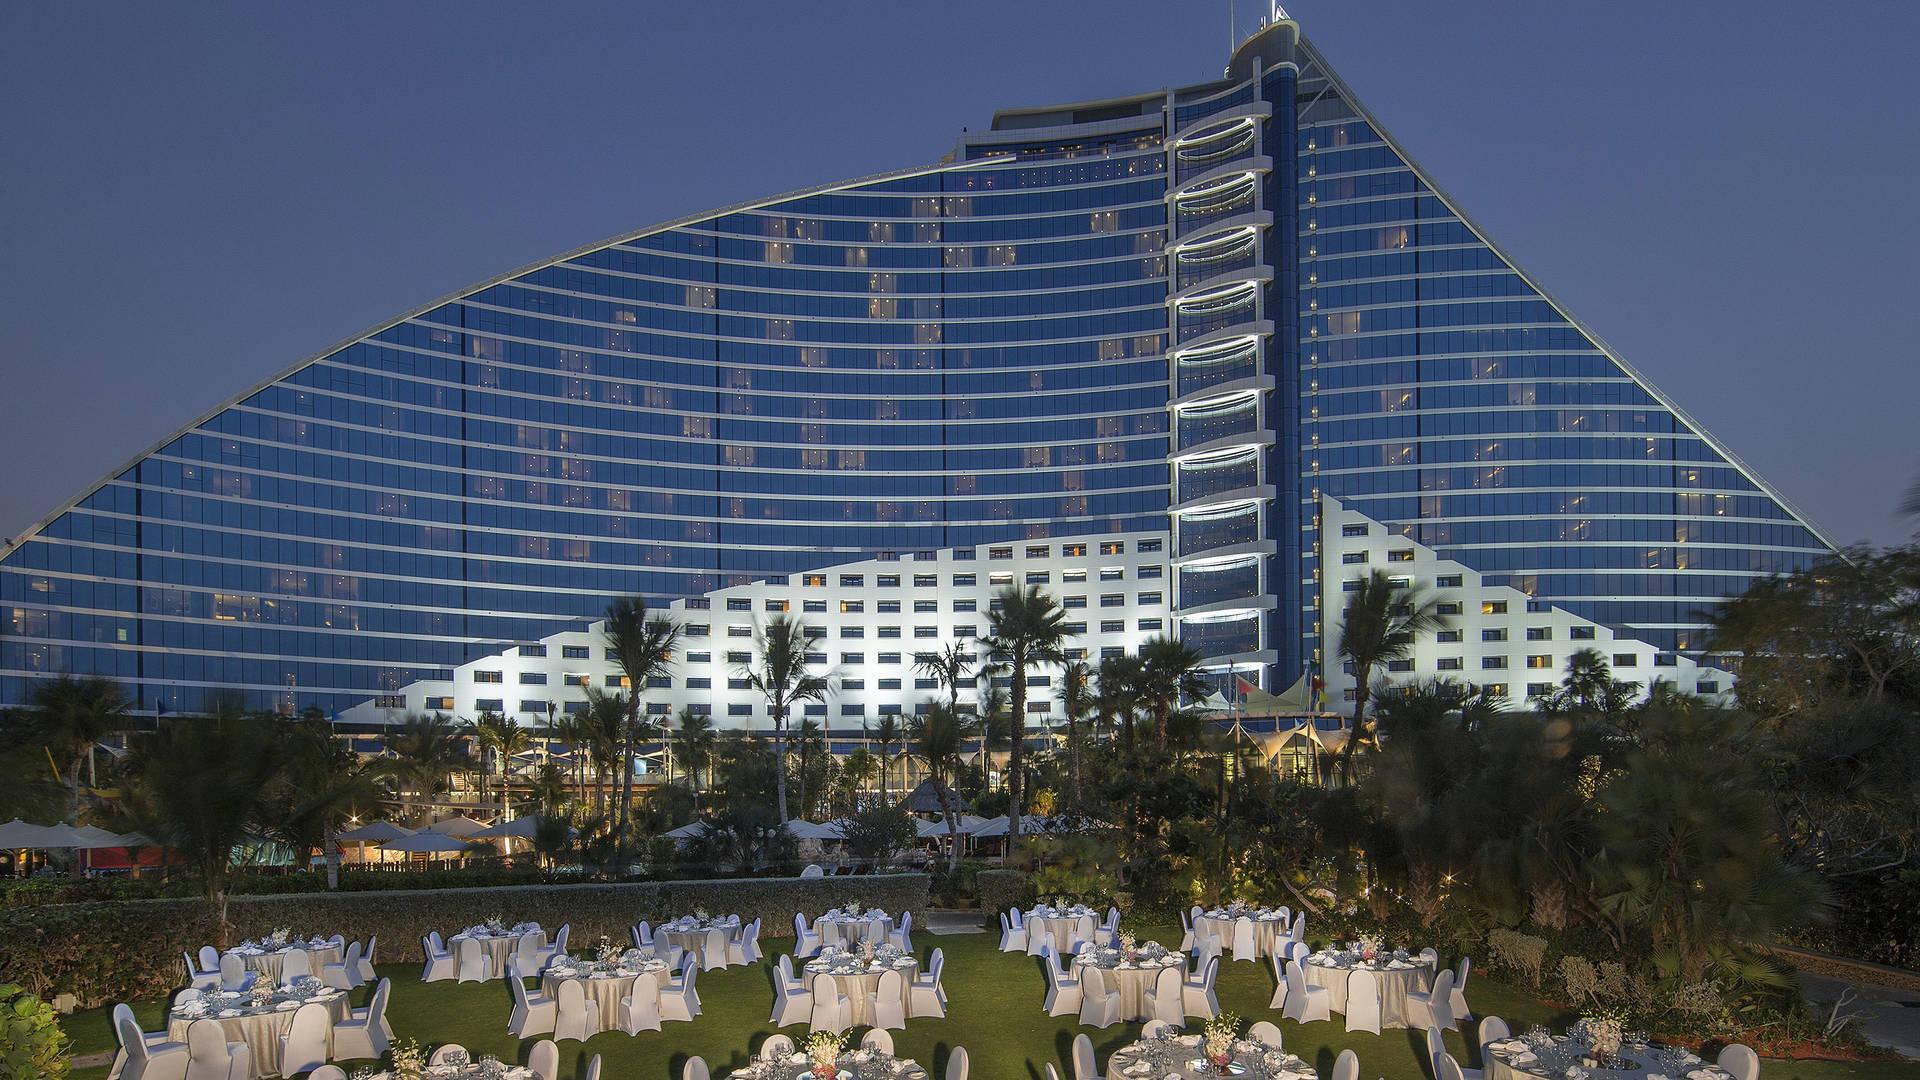 https://cdn.jumeirah.com/-/mediadh/DH/Hospitality/Jumeirah/Article/Stories/Dubai/Amazing-Venues-in-Dubai-to-Host-an-Event/Jumeirah-Beach-Hotel-Sunset-Garden-Dinner-Setup-16-9.jpg?h=1080&w=1920&hash=0D1D5C6081957500675F00FDA1D7FB3E